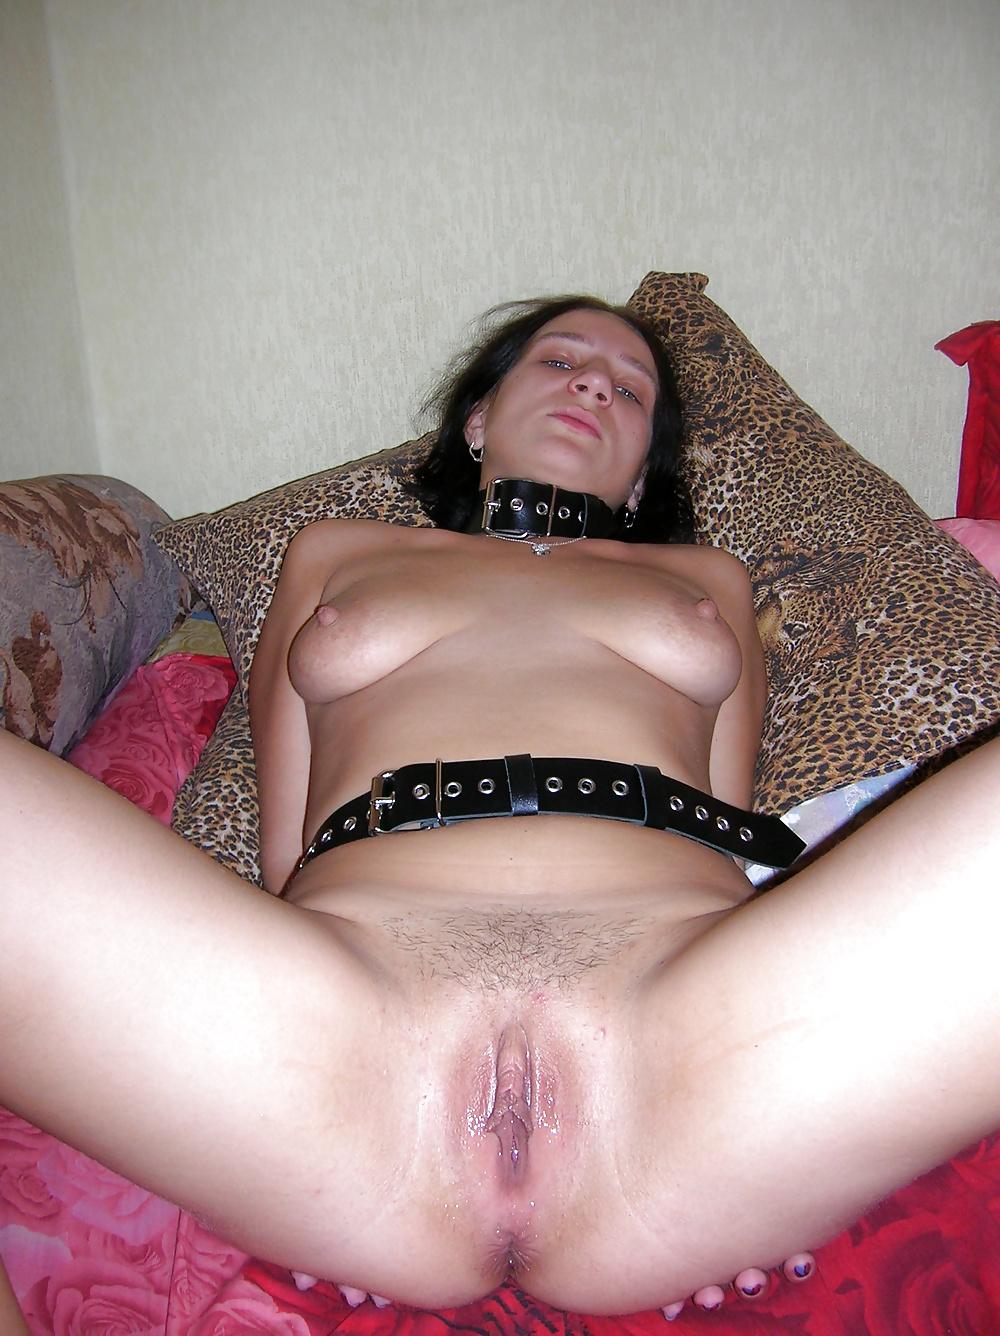 Фото секс украинки домашнее, лесбиянки с пушистыми лобками фото